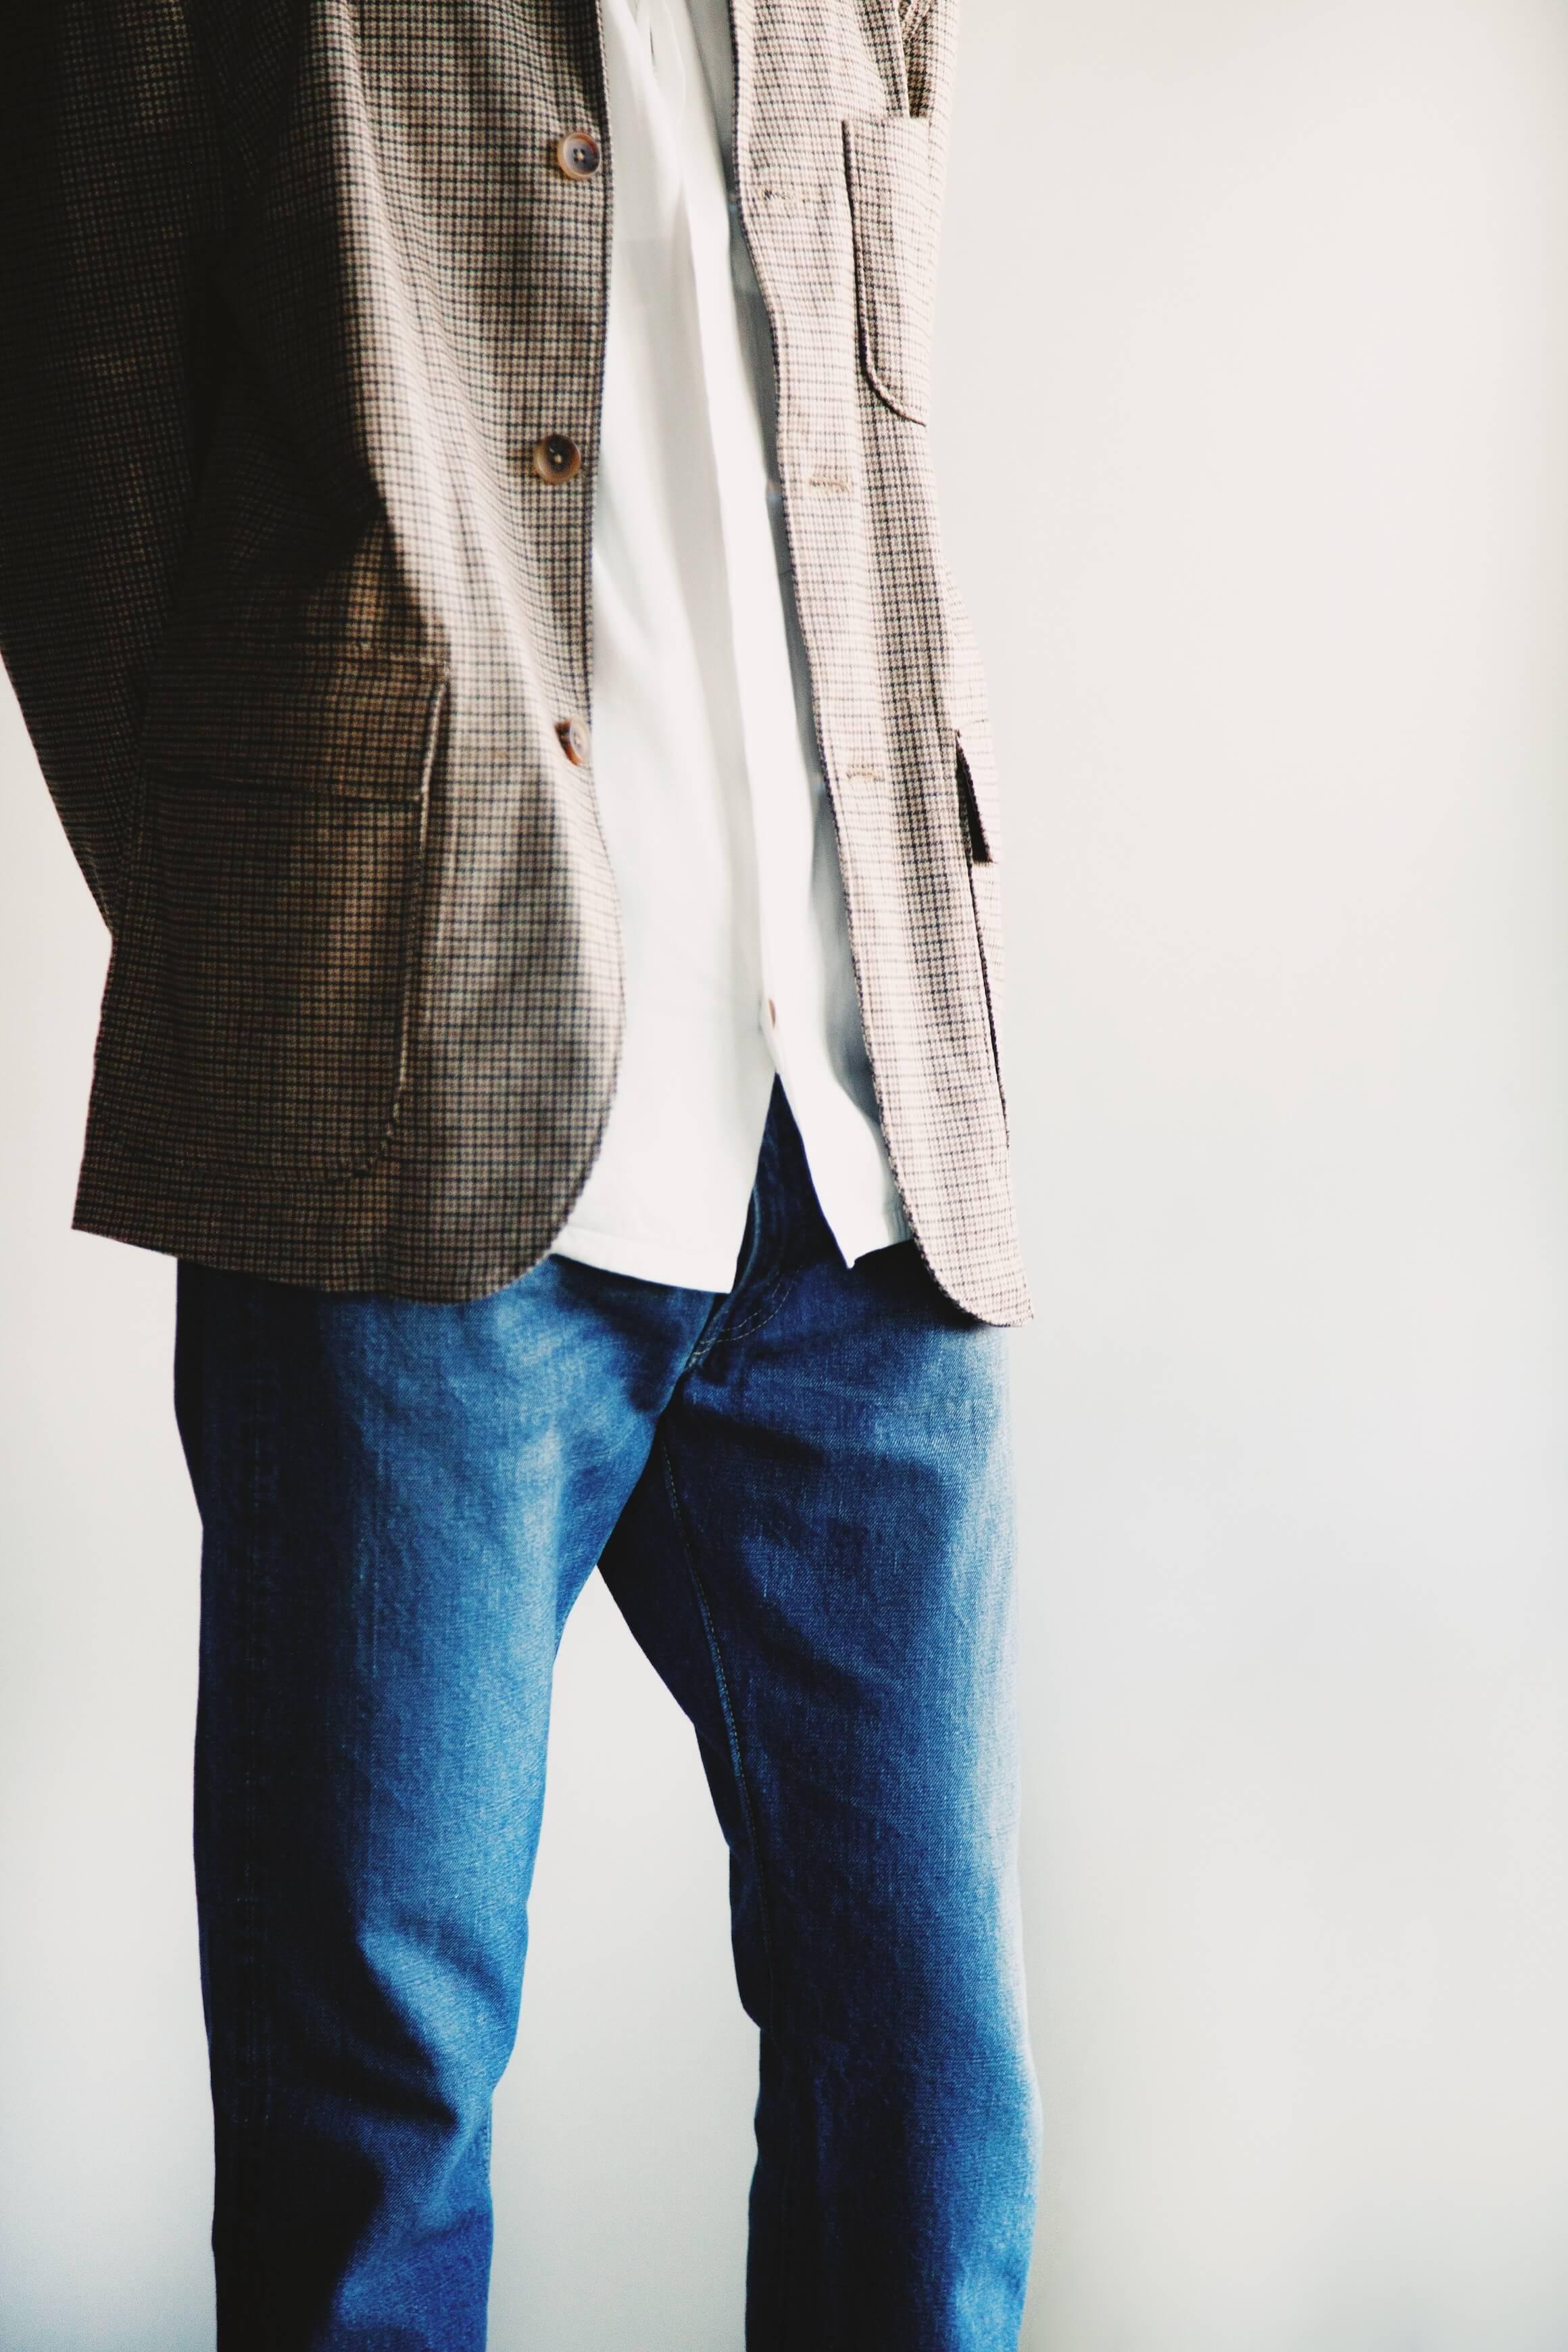 Engineered garments loiter jacket, visvim free edge shirt, orslow 105 standard denim on body